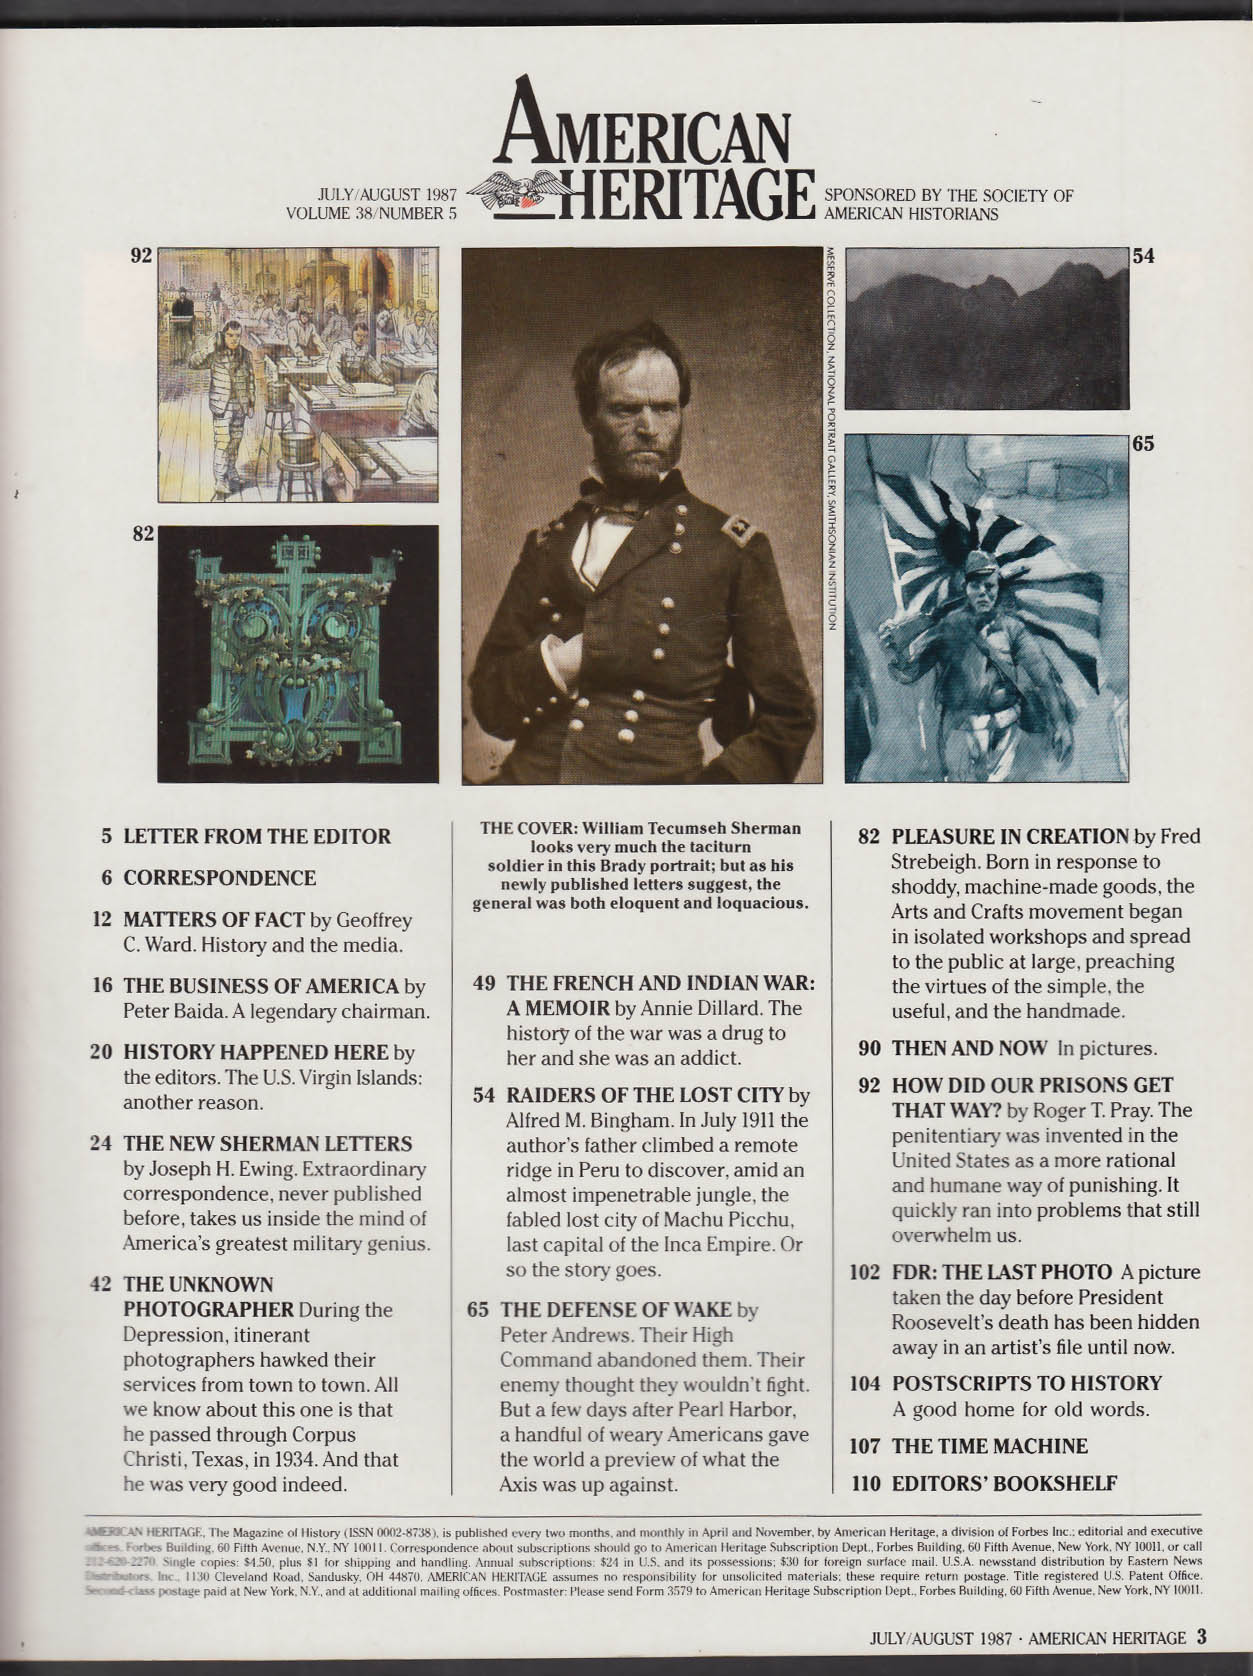 AMERICAN HERITAGE William Tecumseh Sherman FDR + 7-8 1987